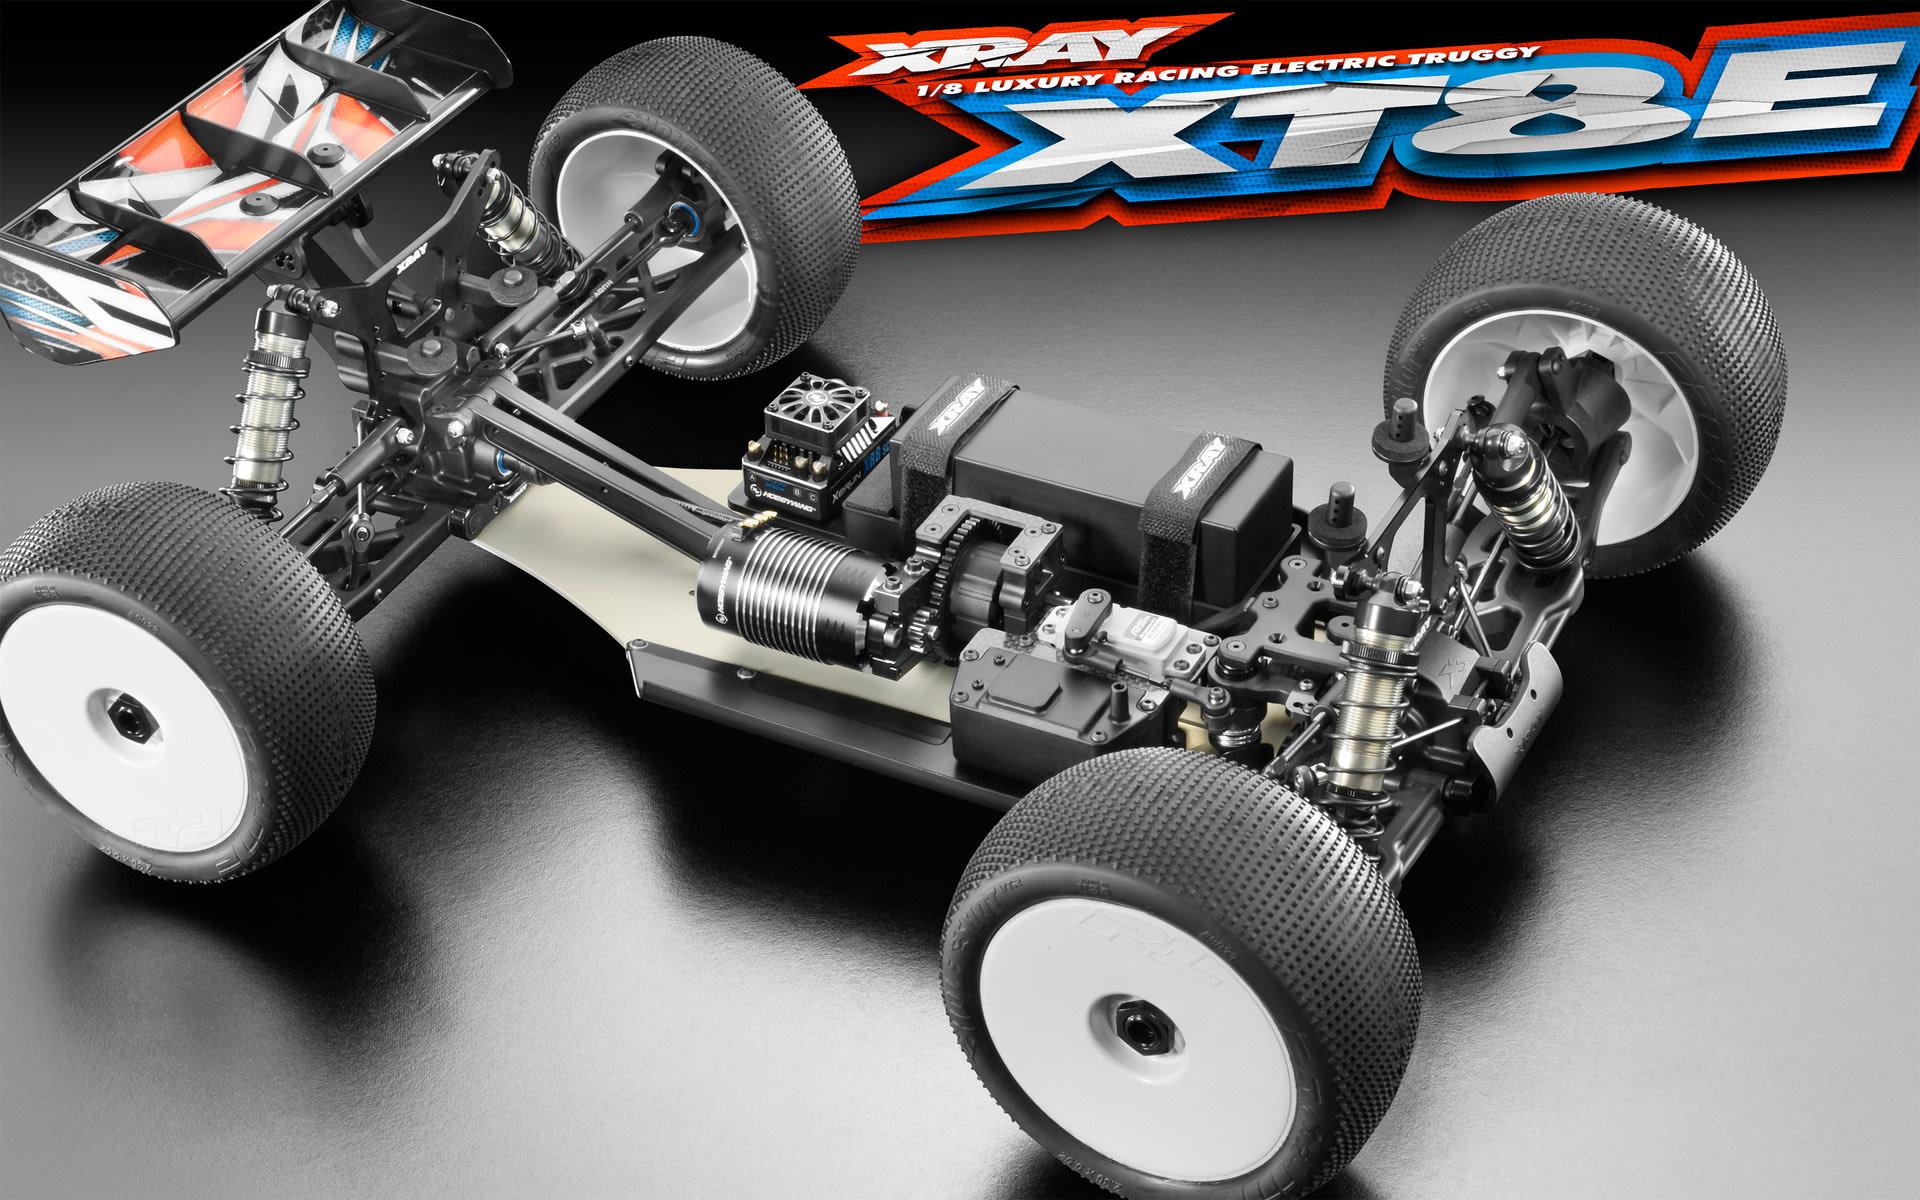 XRA350300 XT8E 2019 Spec Luxury 1/8 Electric Off-Road Truggy Kit